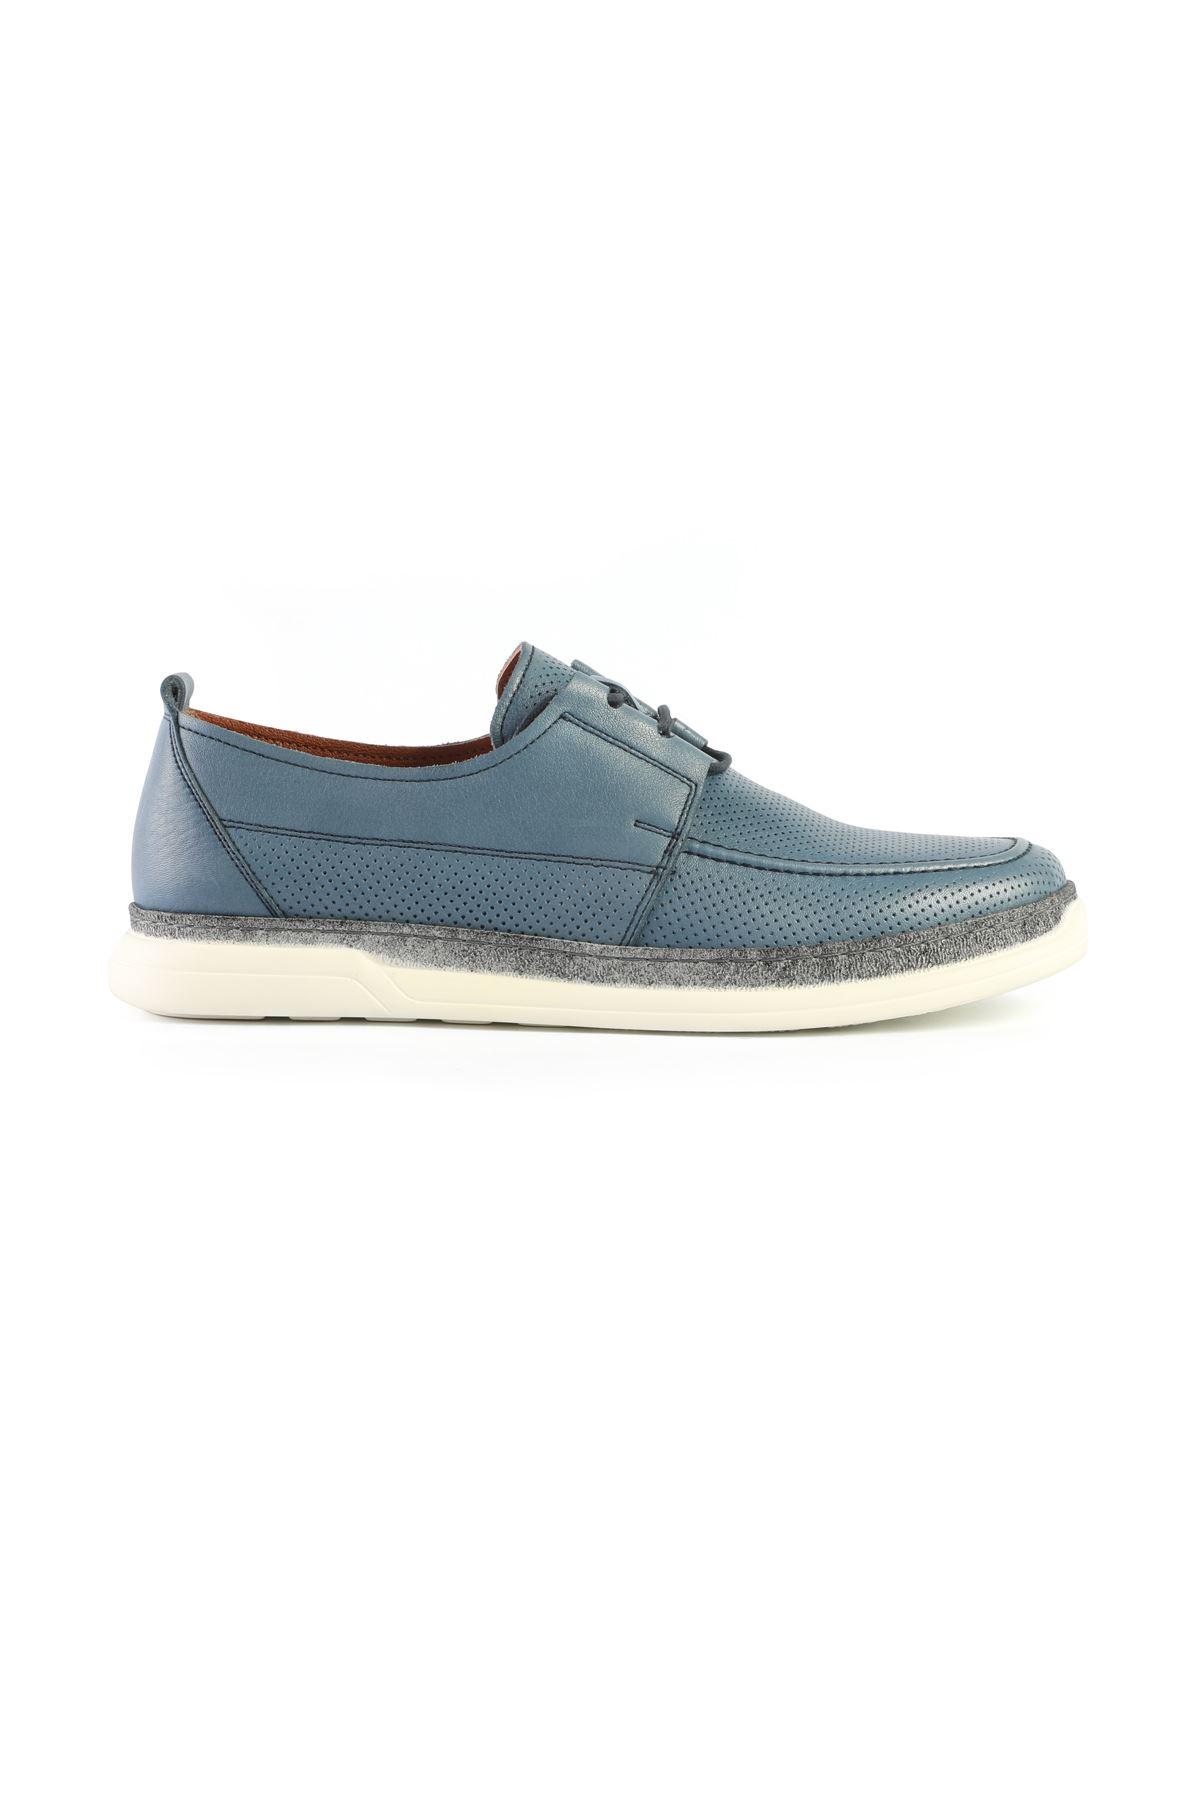 Libero L3418 Mavi Loafer Ayakkabı